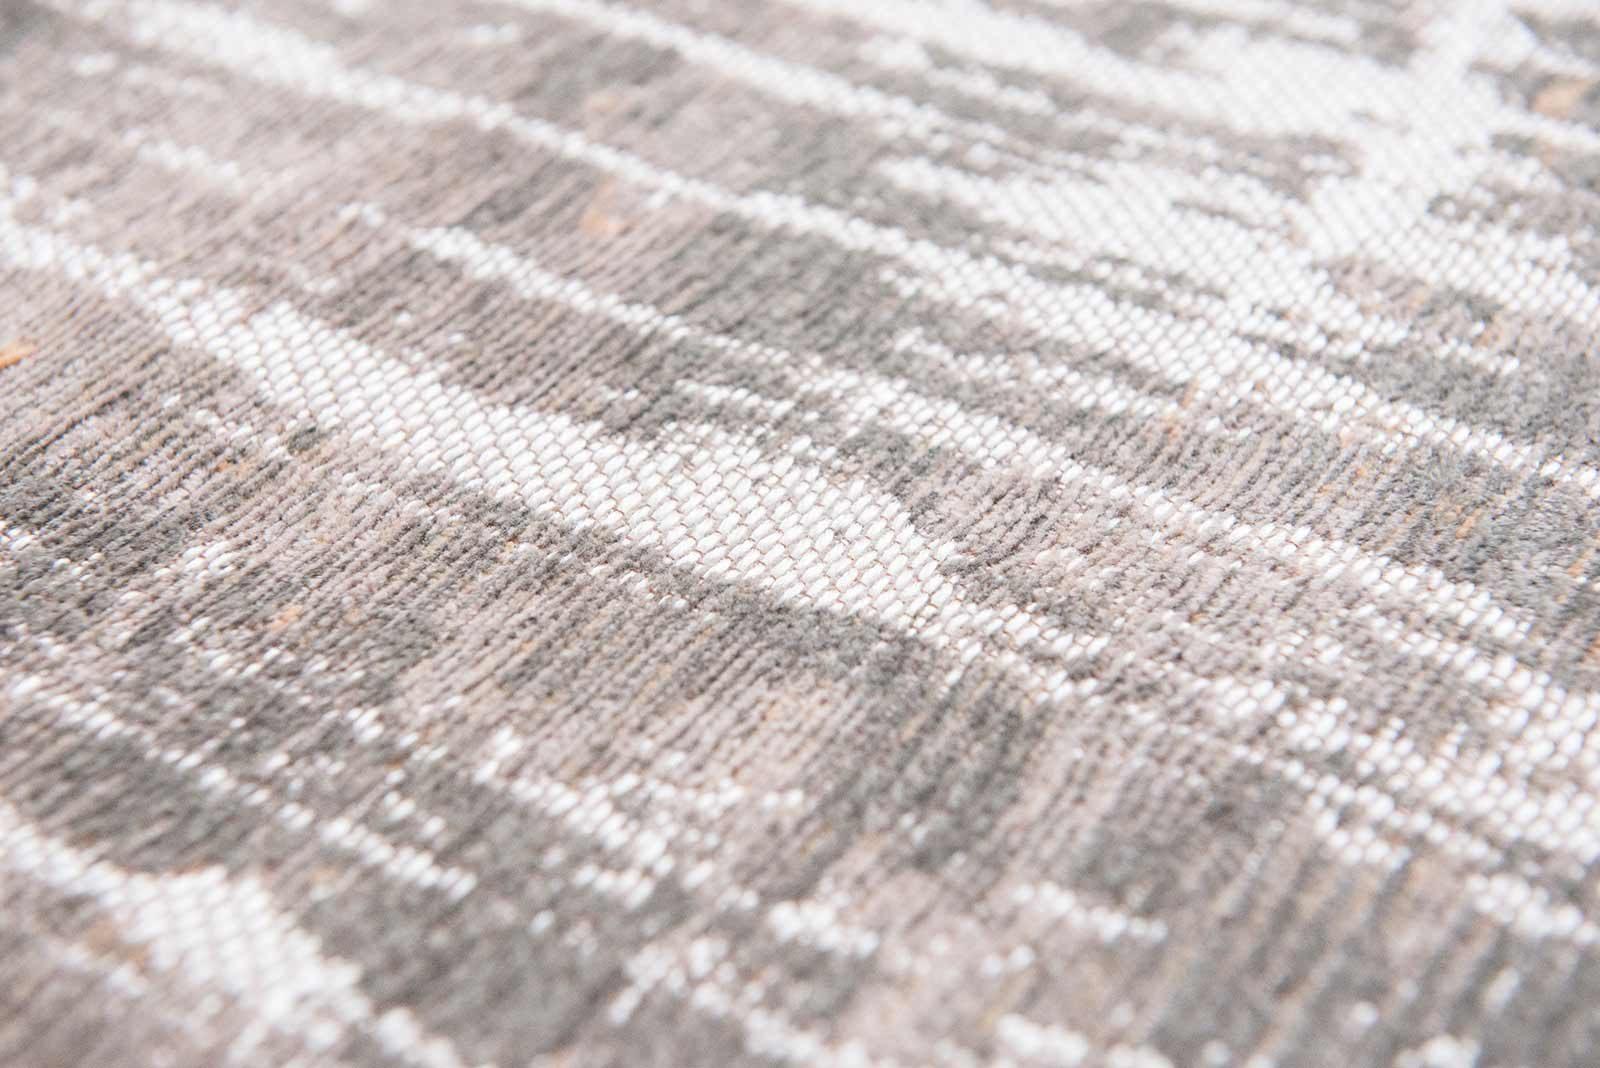 alfombras Louis De Poortere LX8717 Atlantic Streaks Parsons Powder zoom 1